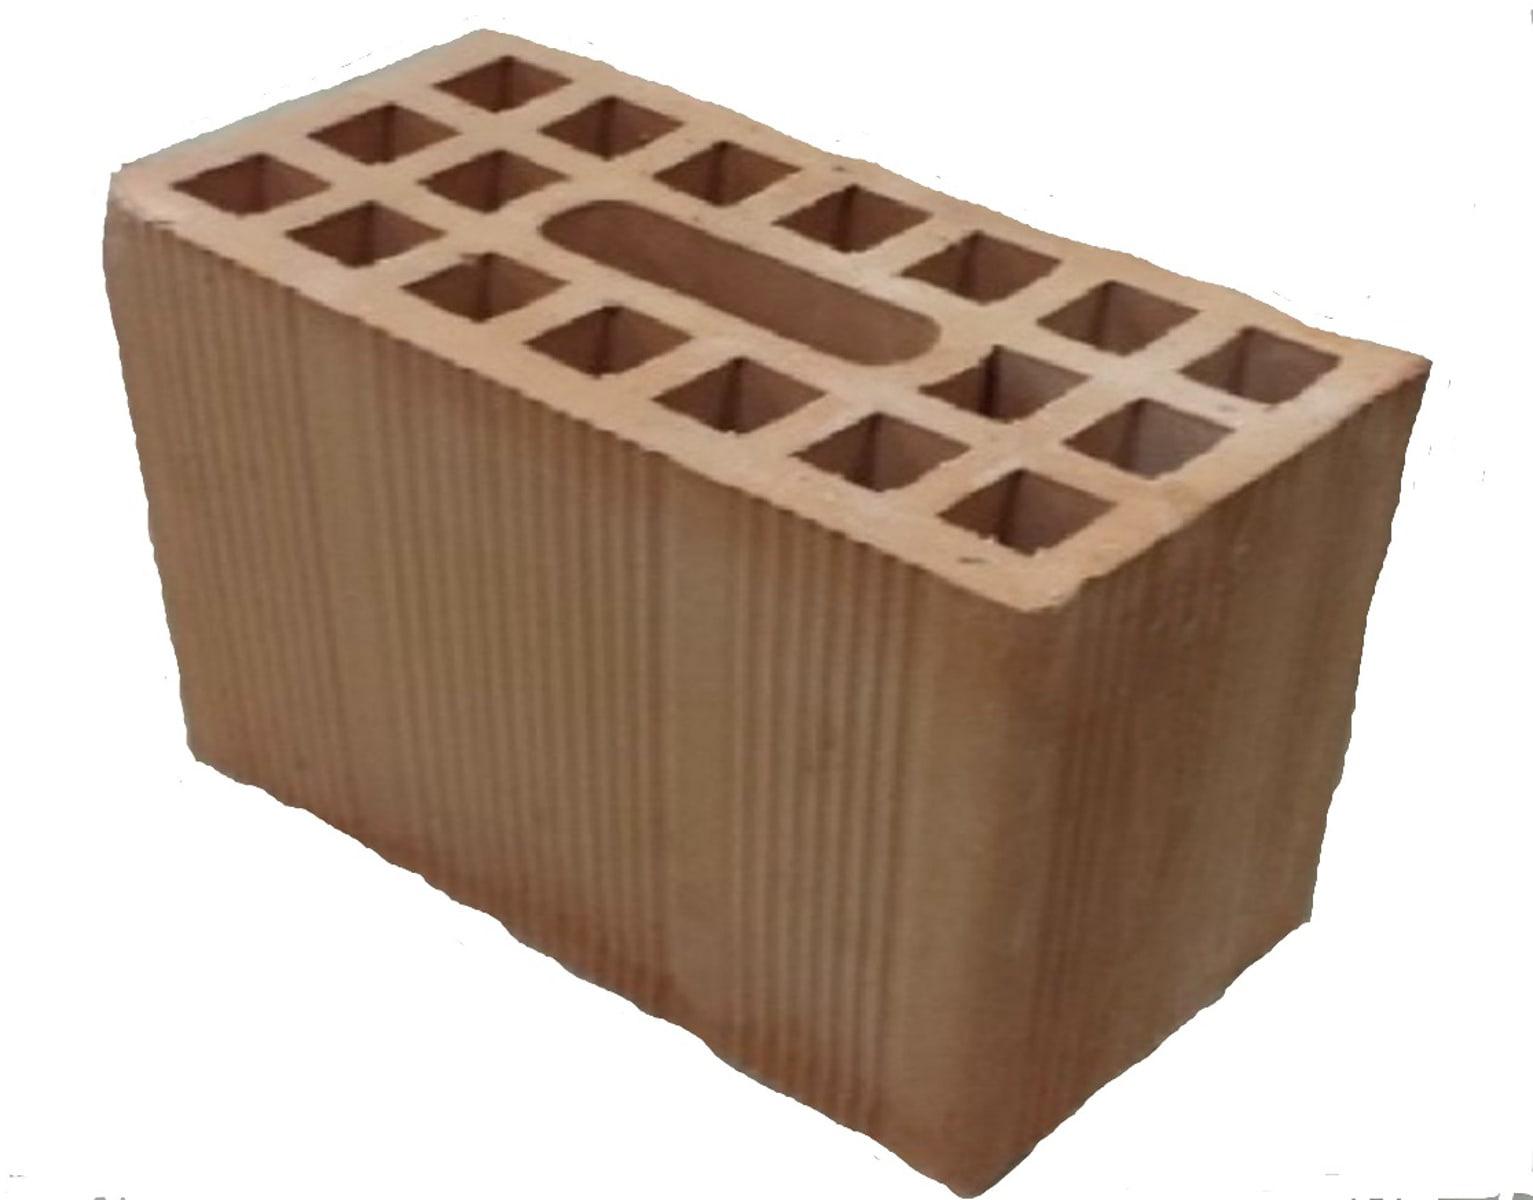 Portabottiglie in legno leroy merlin tavolo legno leroy for Portabottiglie leroy merlin